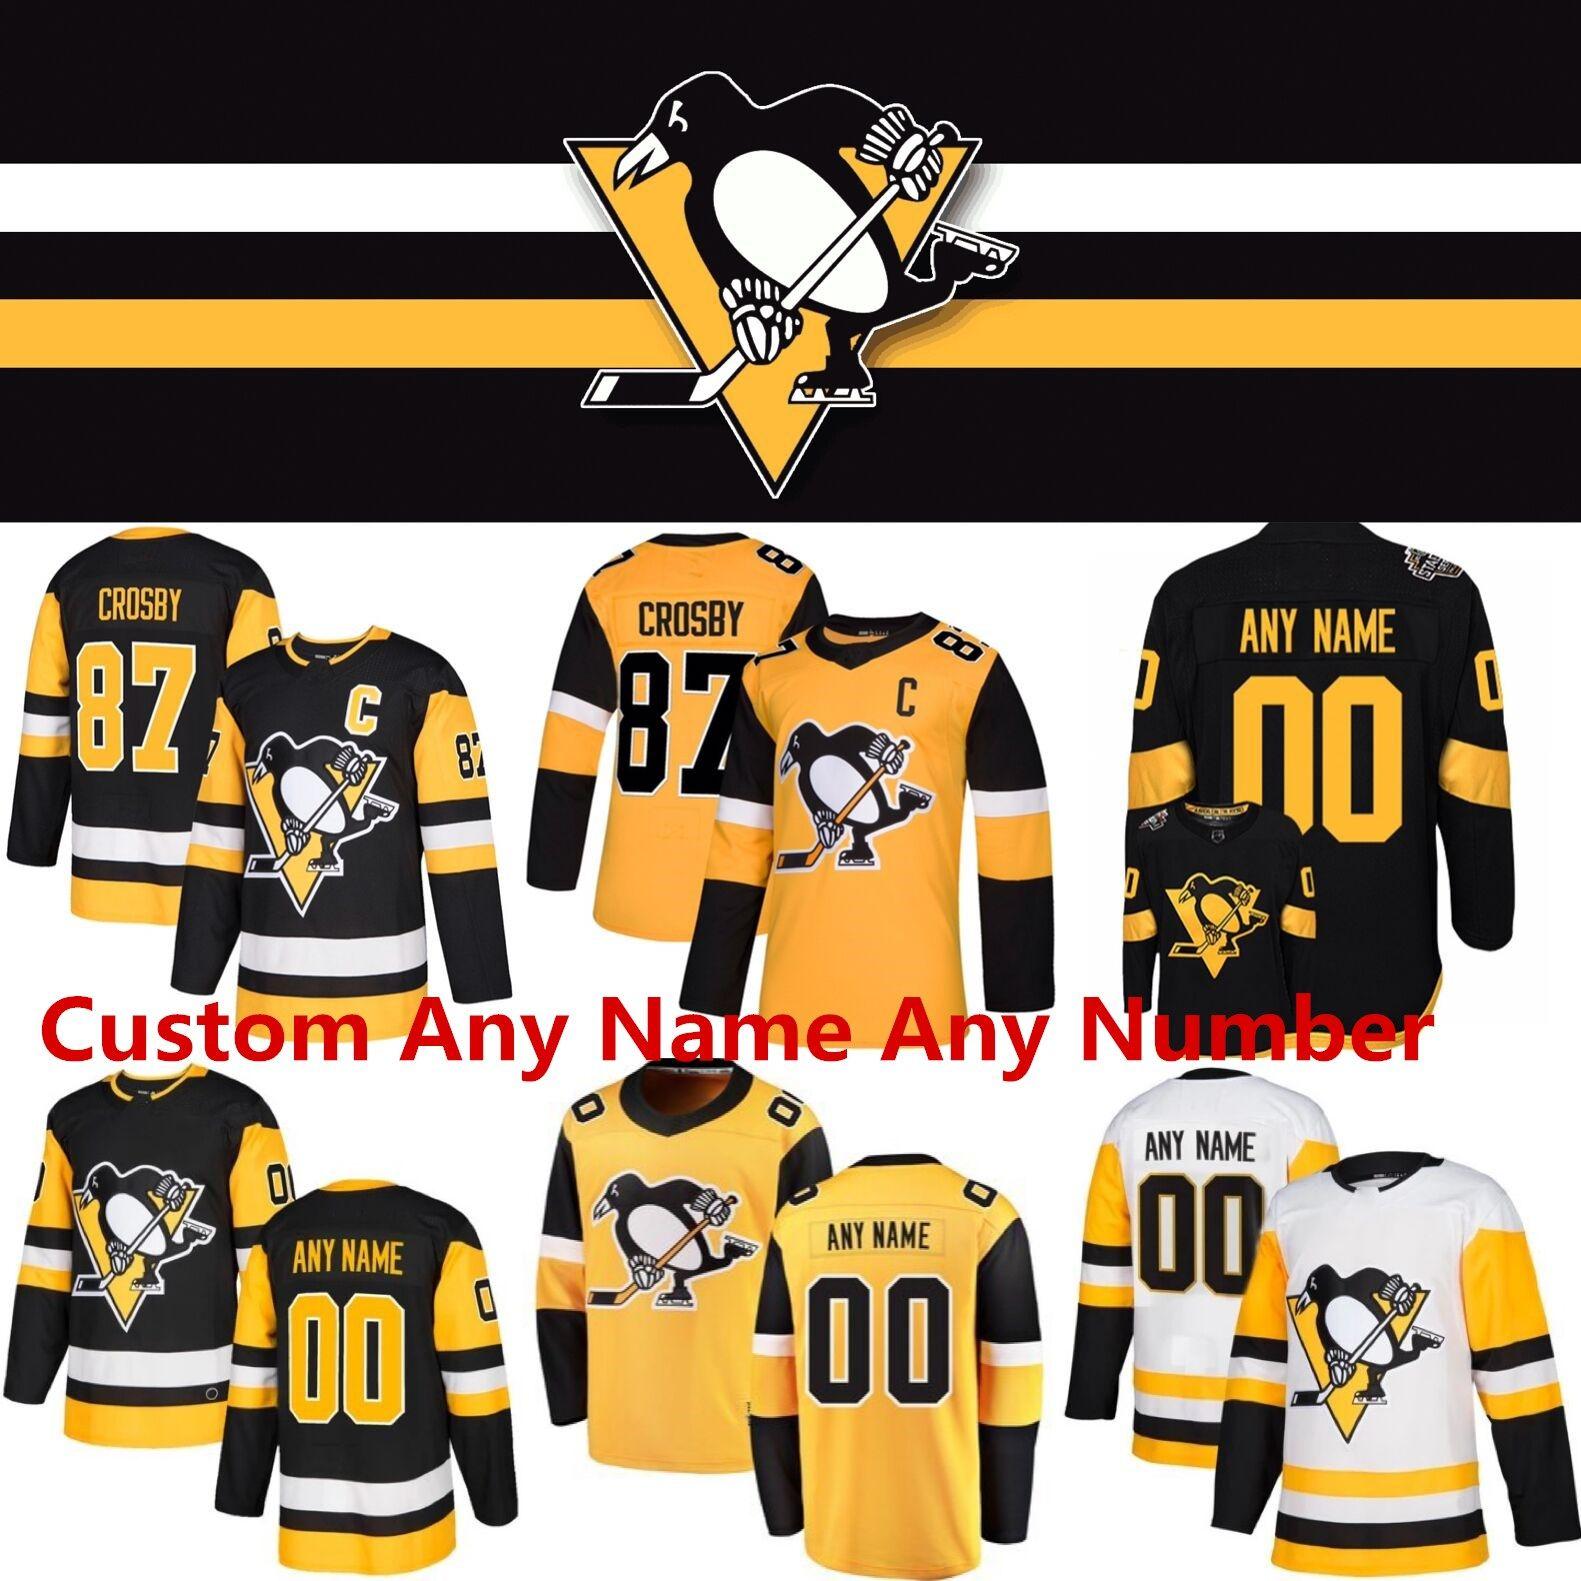 2020 Penguins de Pittsburgh Sidney Crosby 87 Evgeni Malkin Kris Letang Alex Galchenyuk Matt Murray Nick Bjugstad Jake Guentzel Hockey Maillots